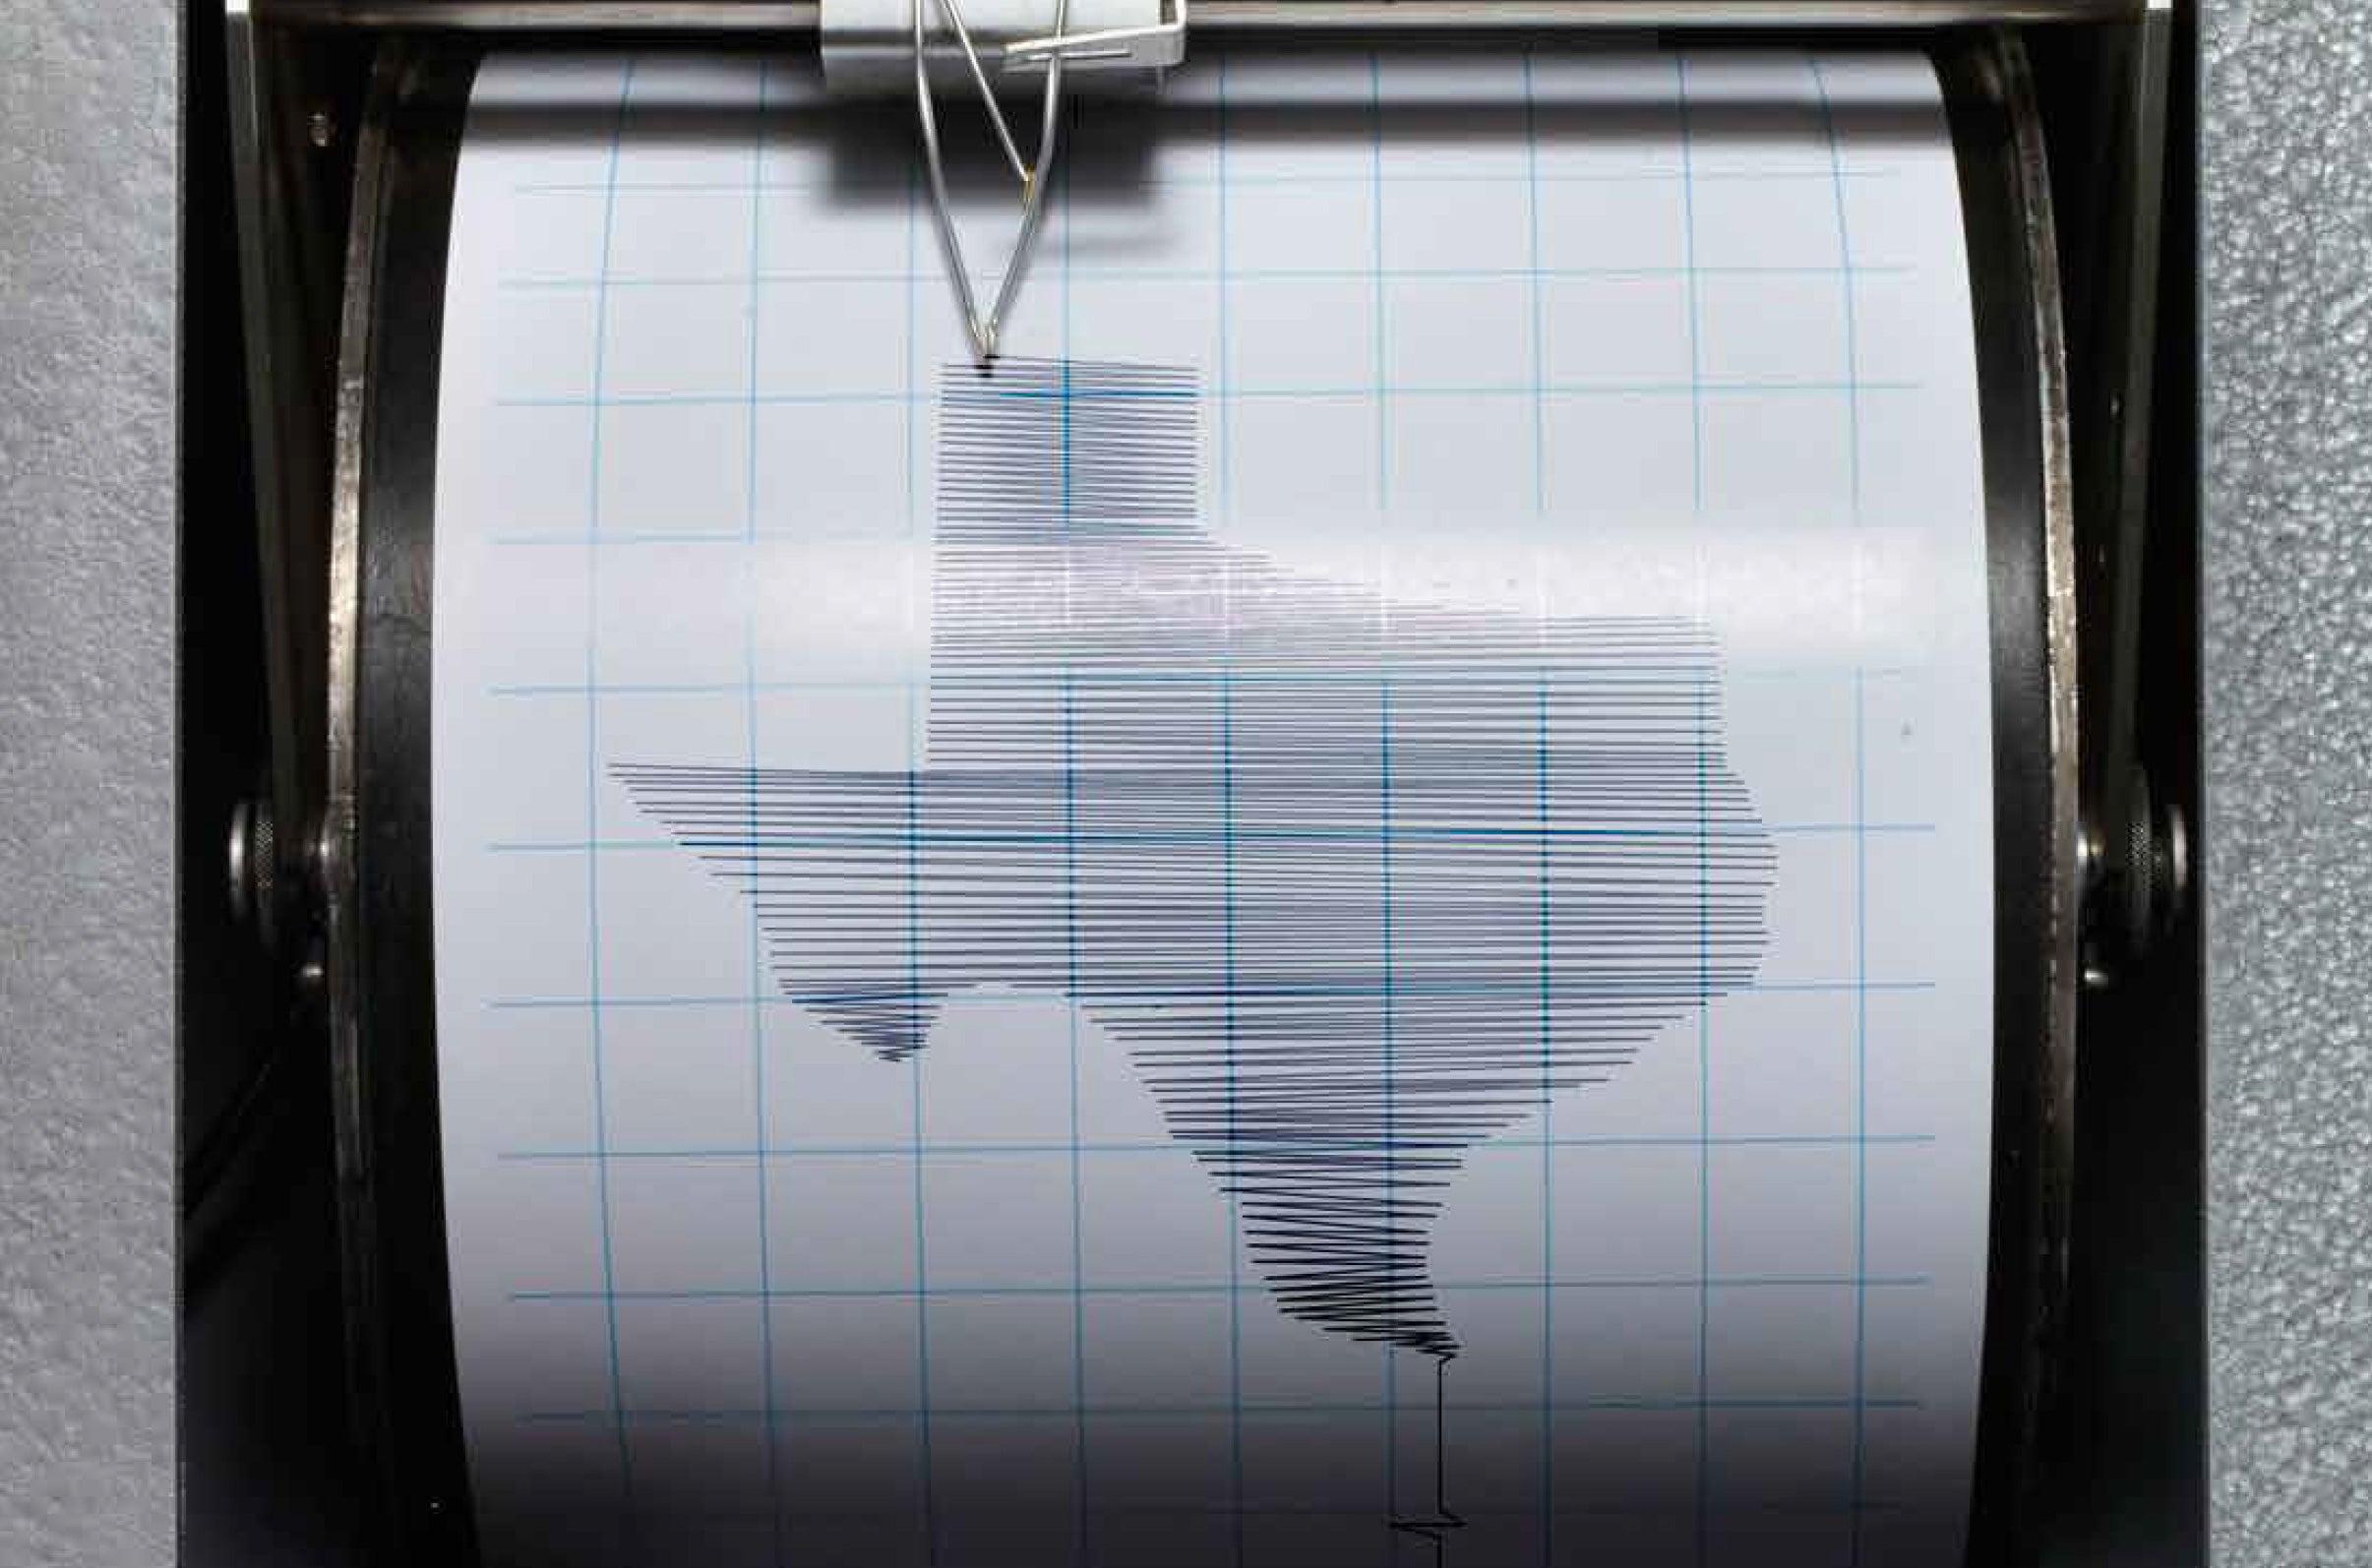 Drilling for Earthquakes - Scientific American